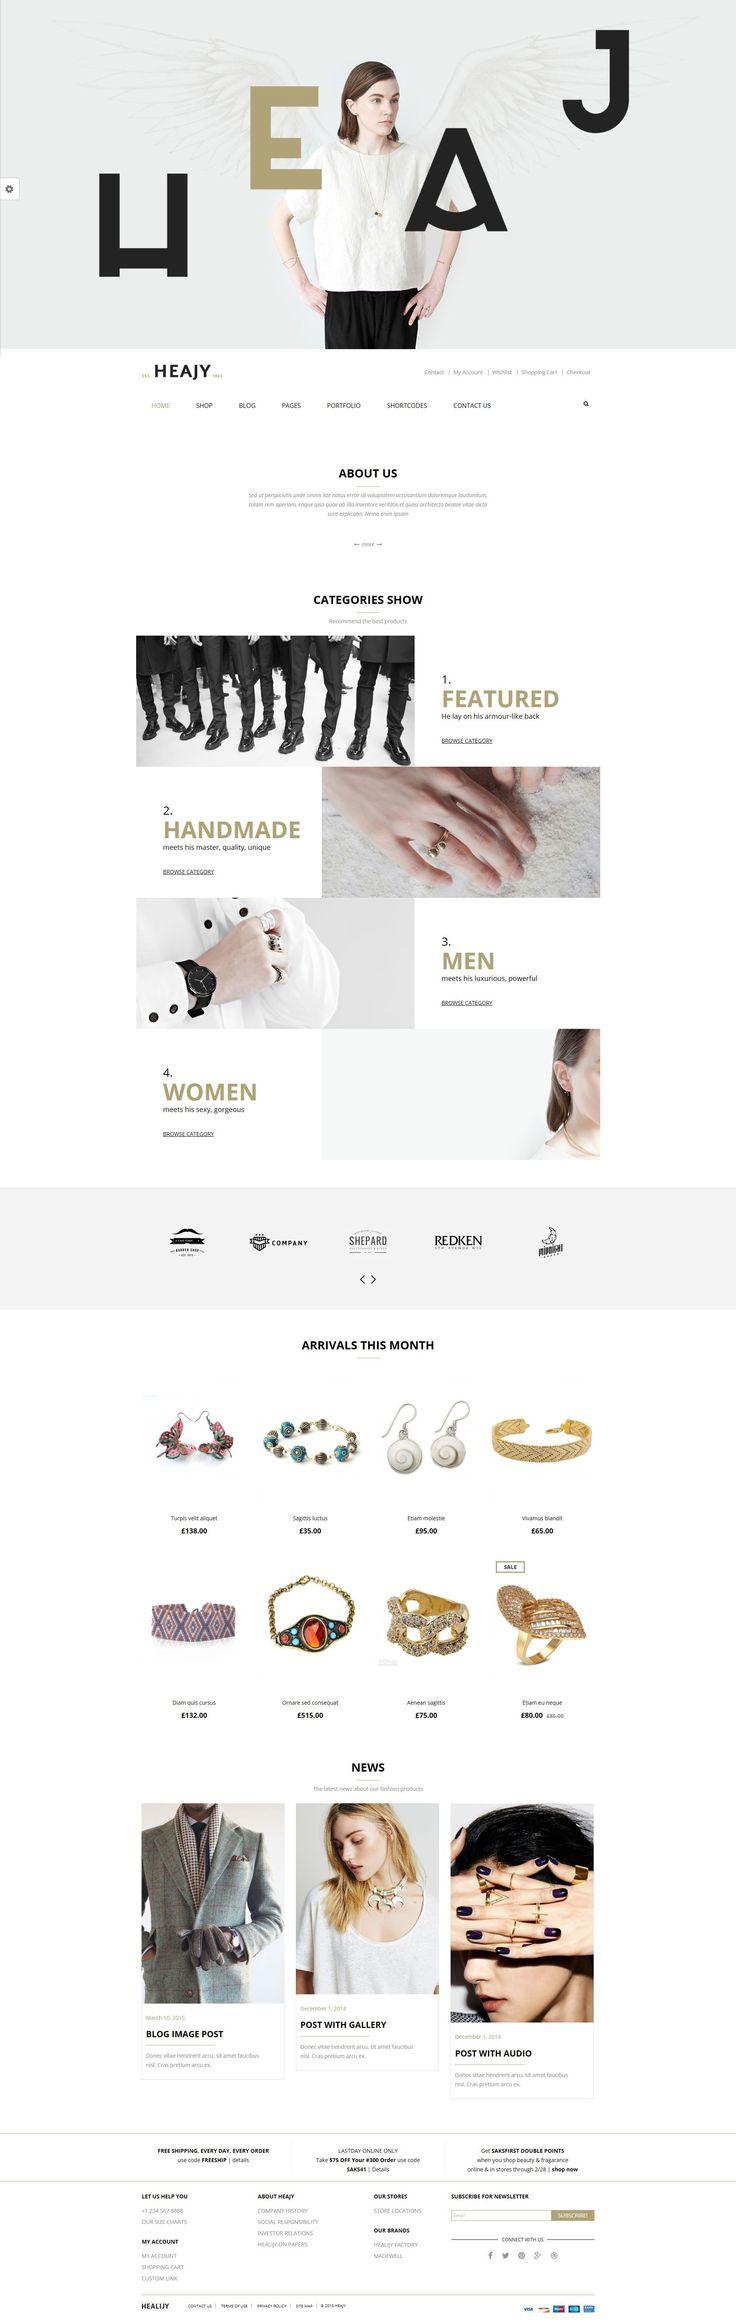 Handmade Fashion WordPress Theme #woocomerce